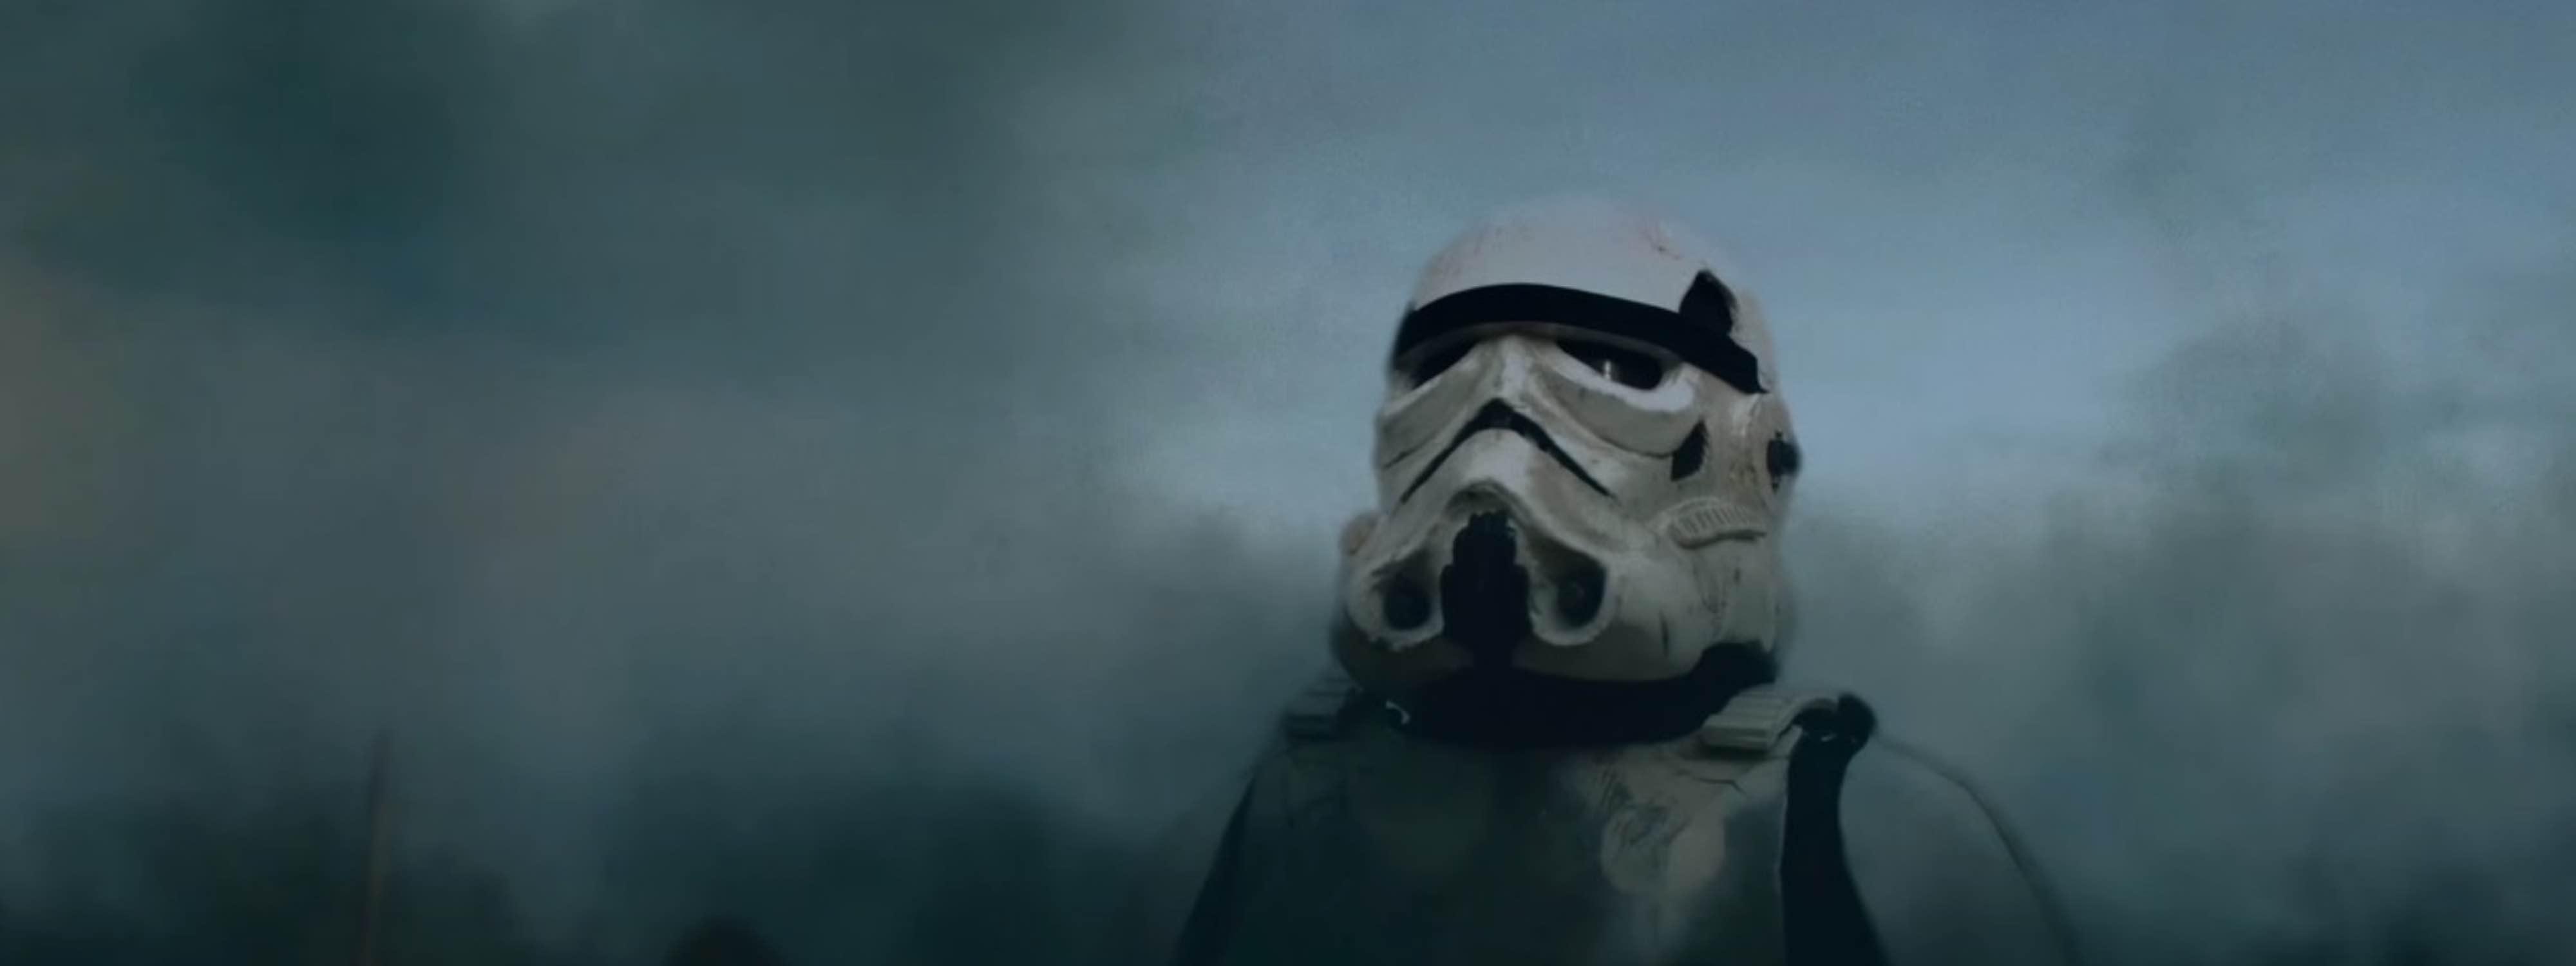 TK-436 – Star Wars: A Stormtrooper Story